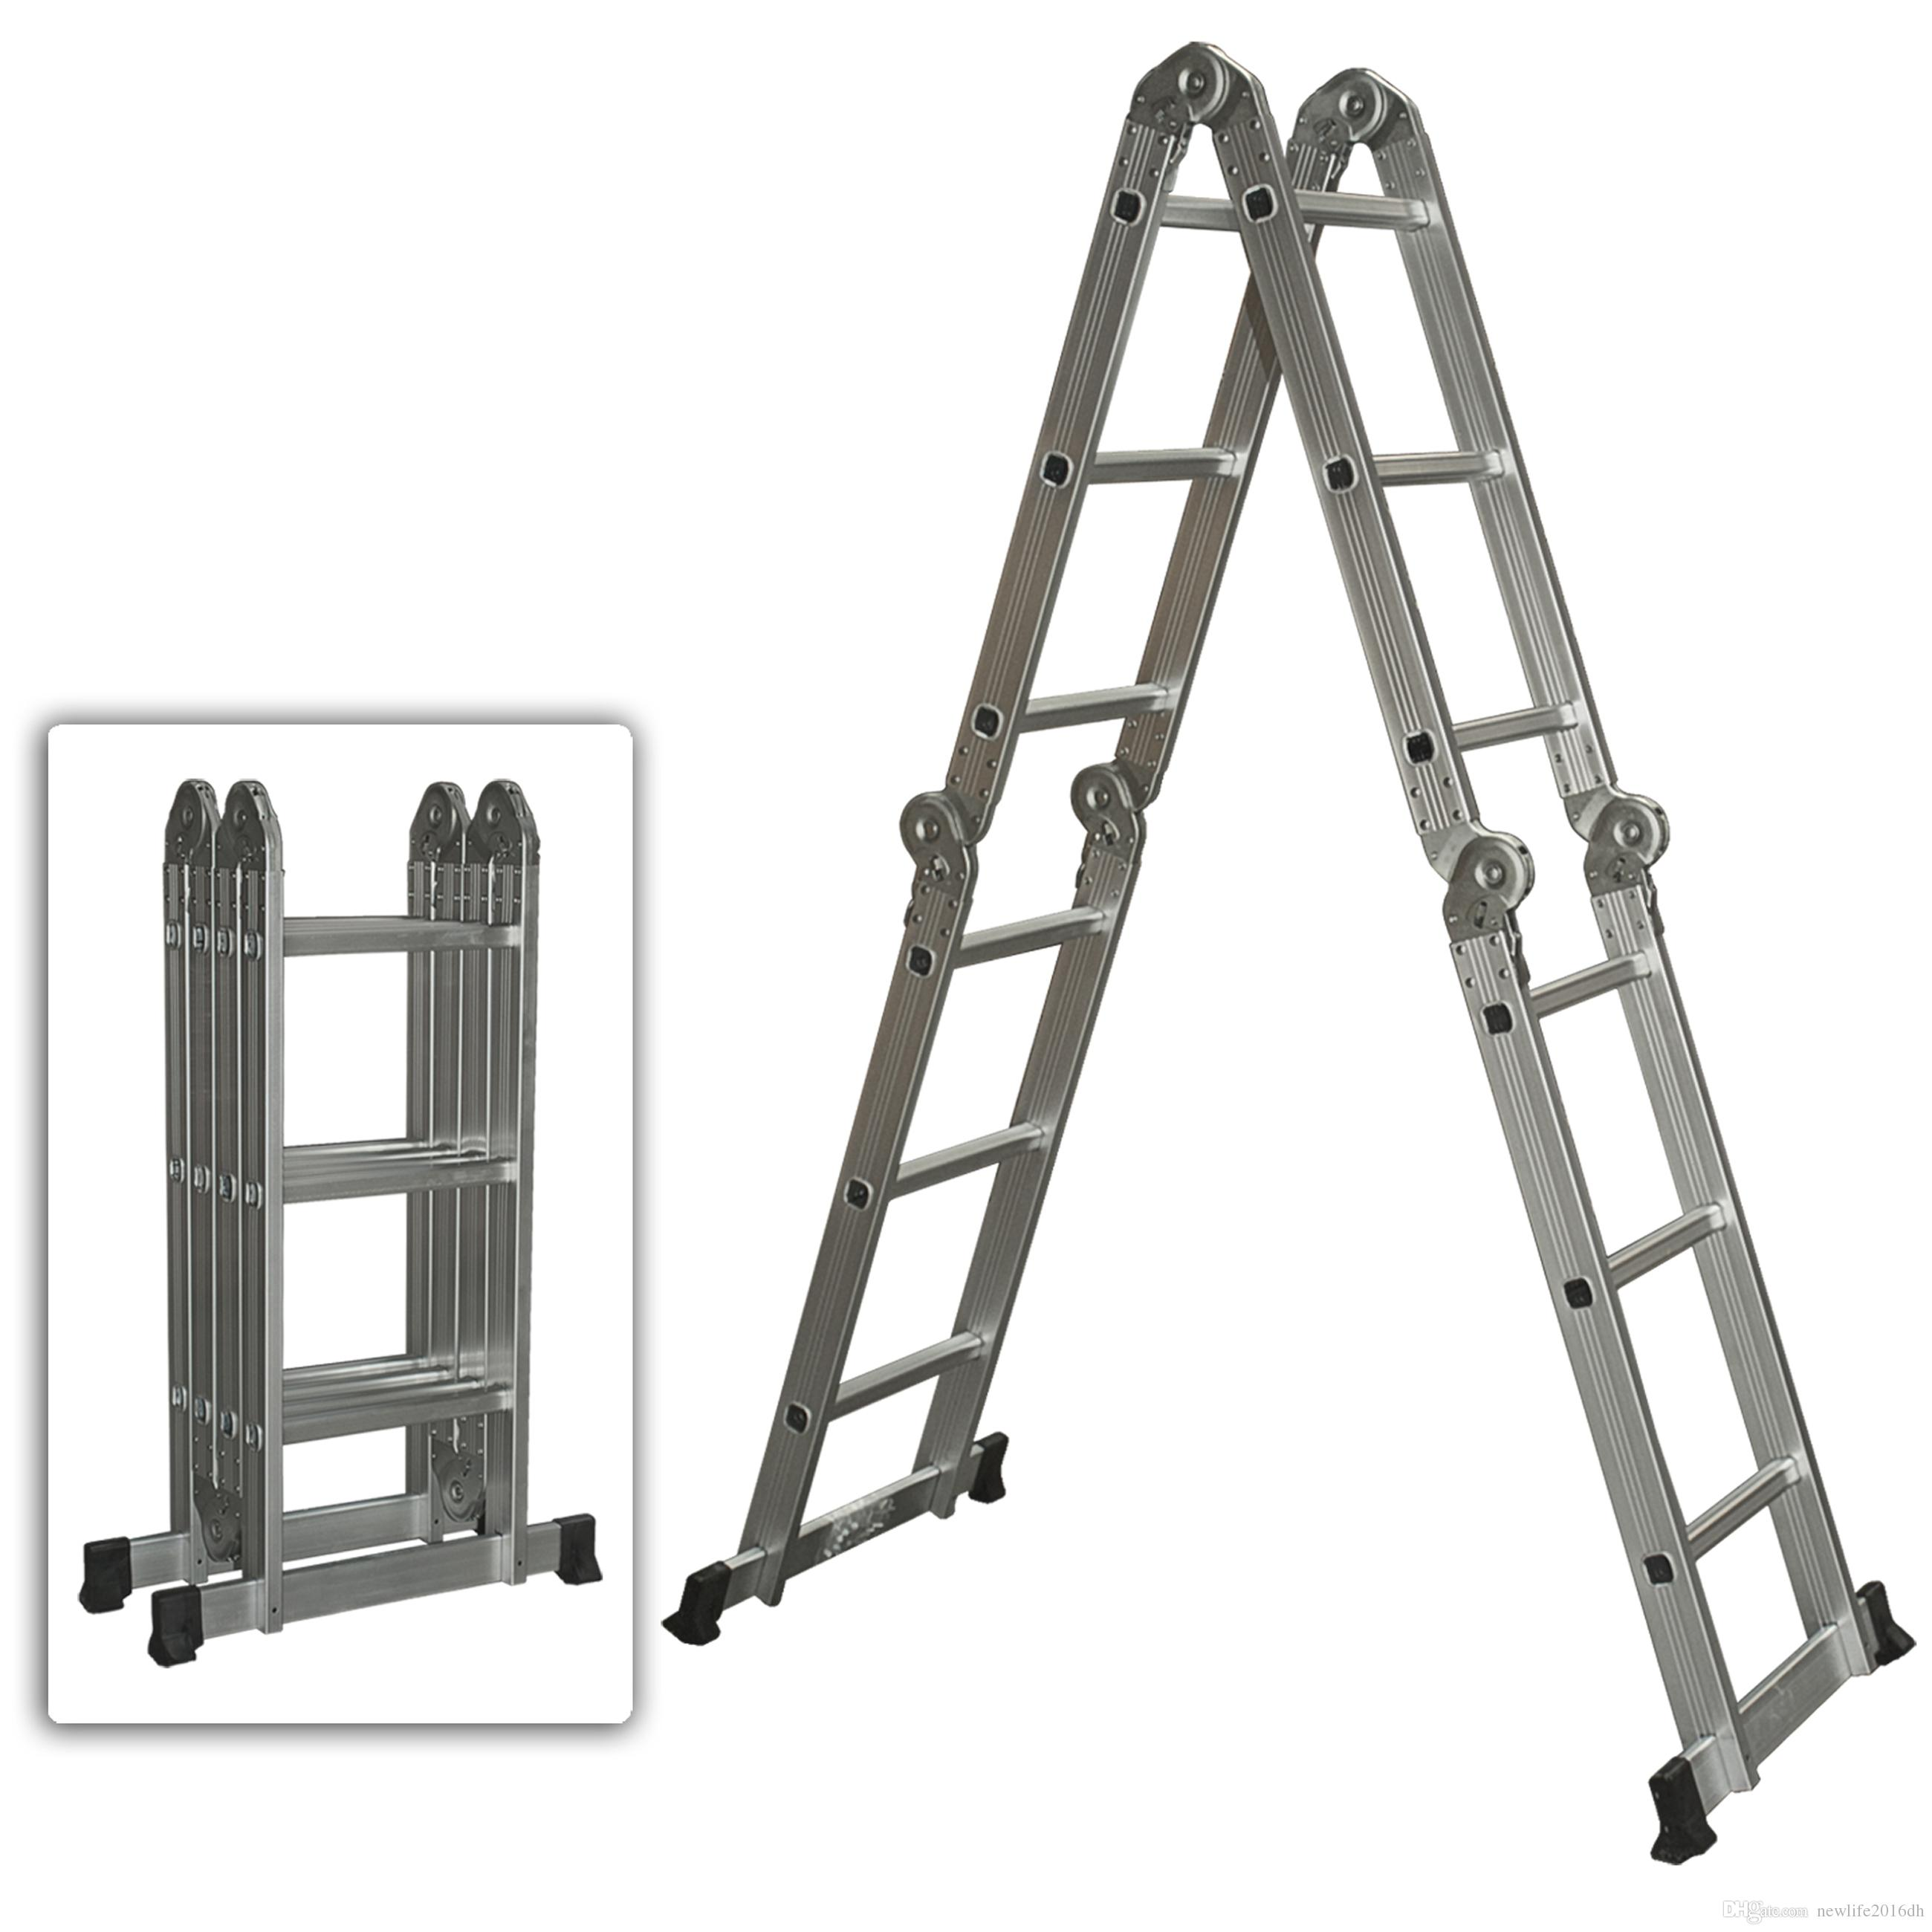 Multi Purpose Aluminum Ladder Folding Step Ladder Extendable Heavy